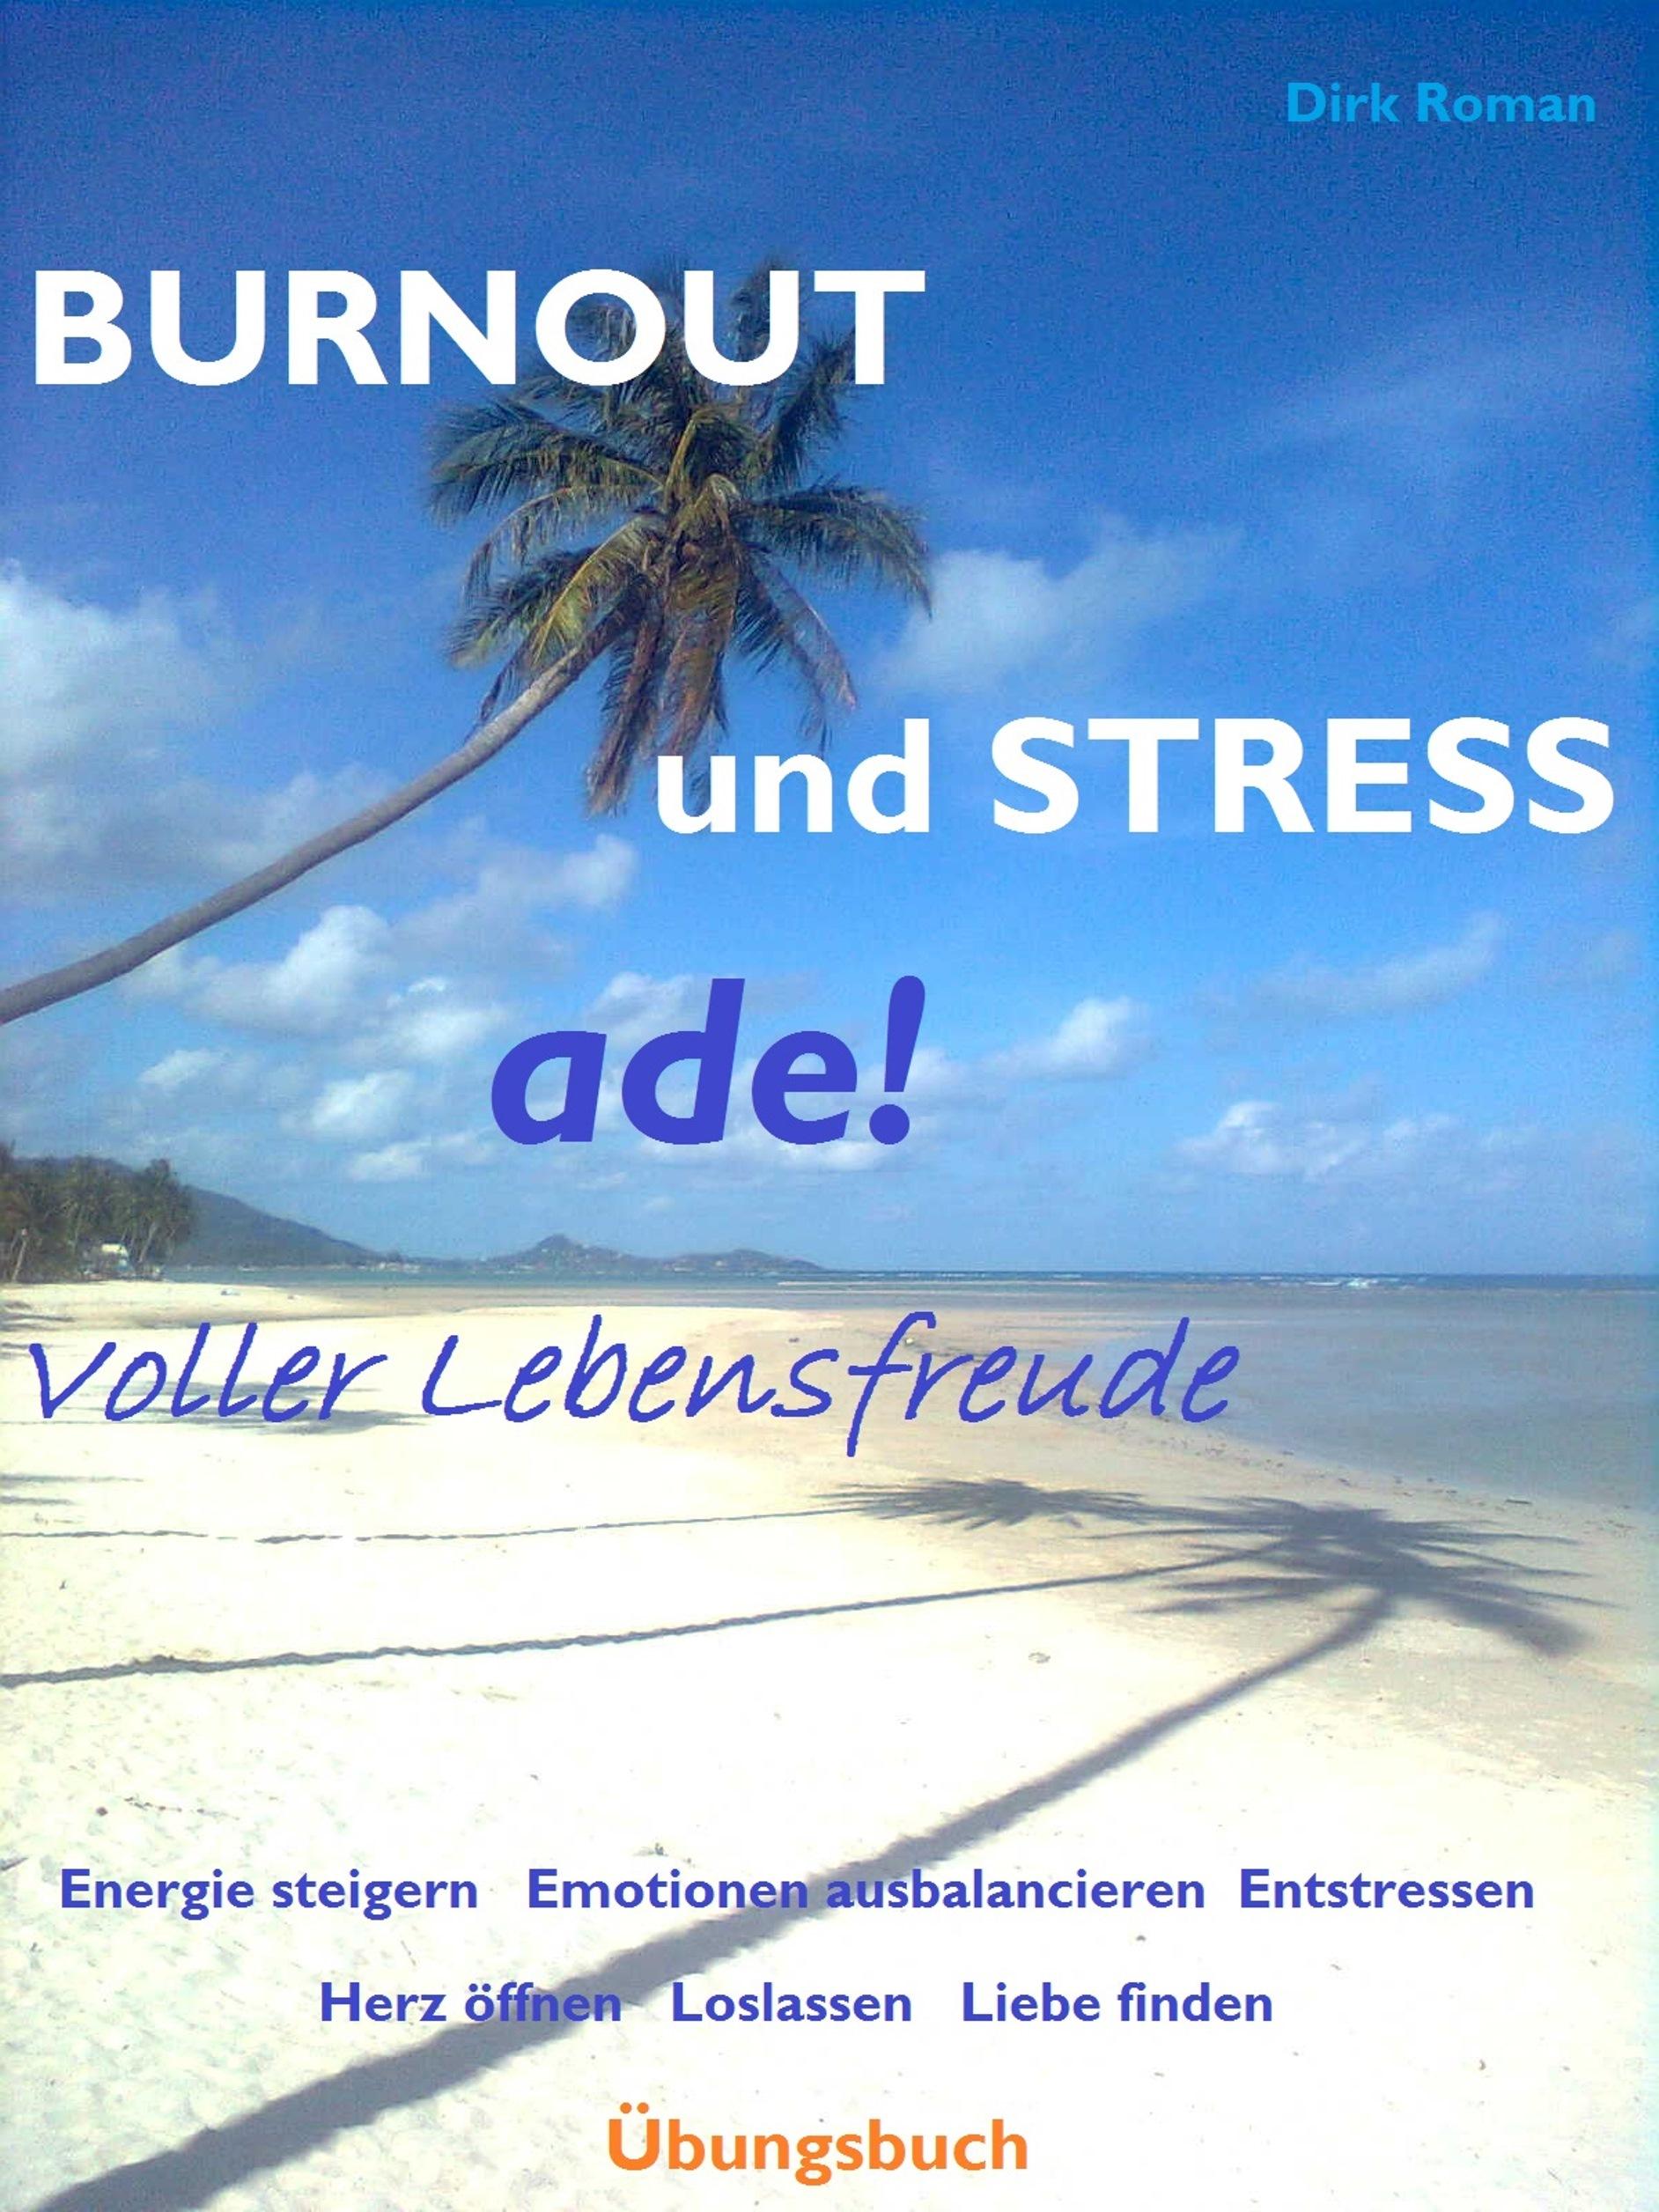 BURNOUT und STRESS ade! inklusive Hypnose mp3 00002